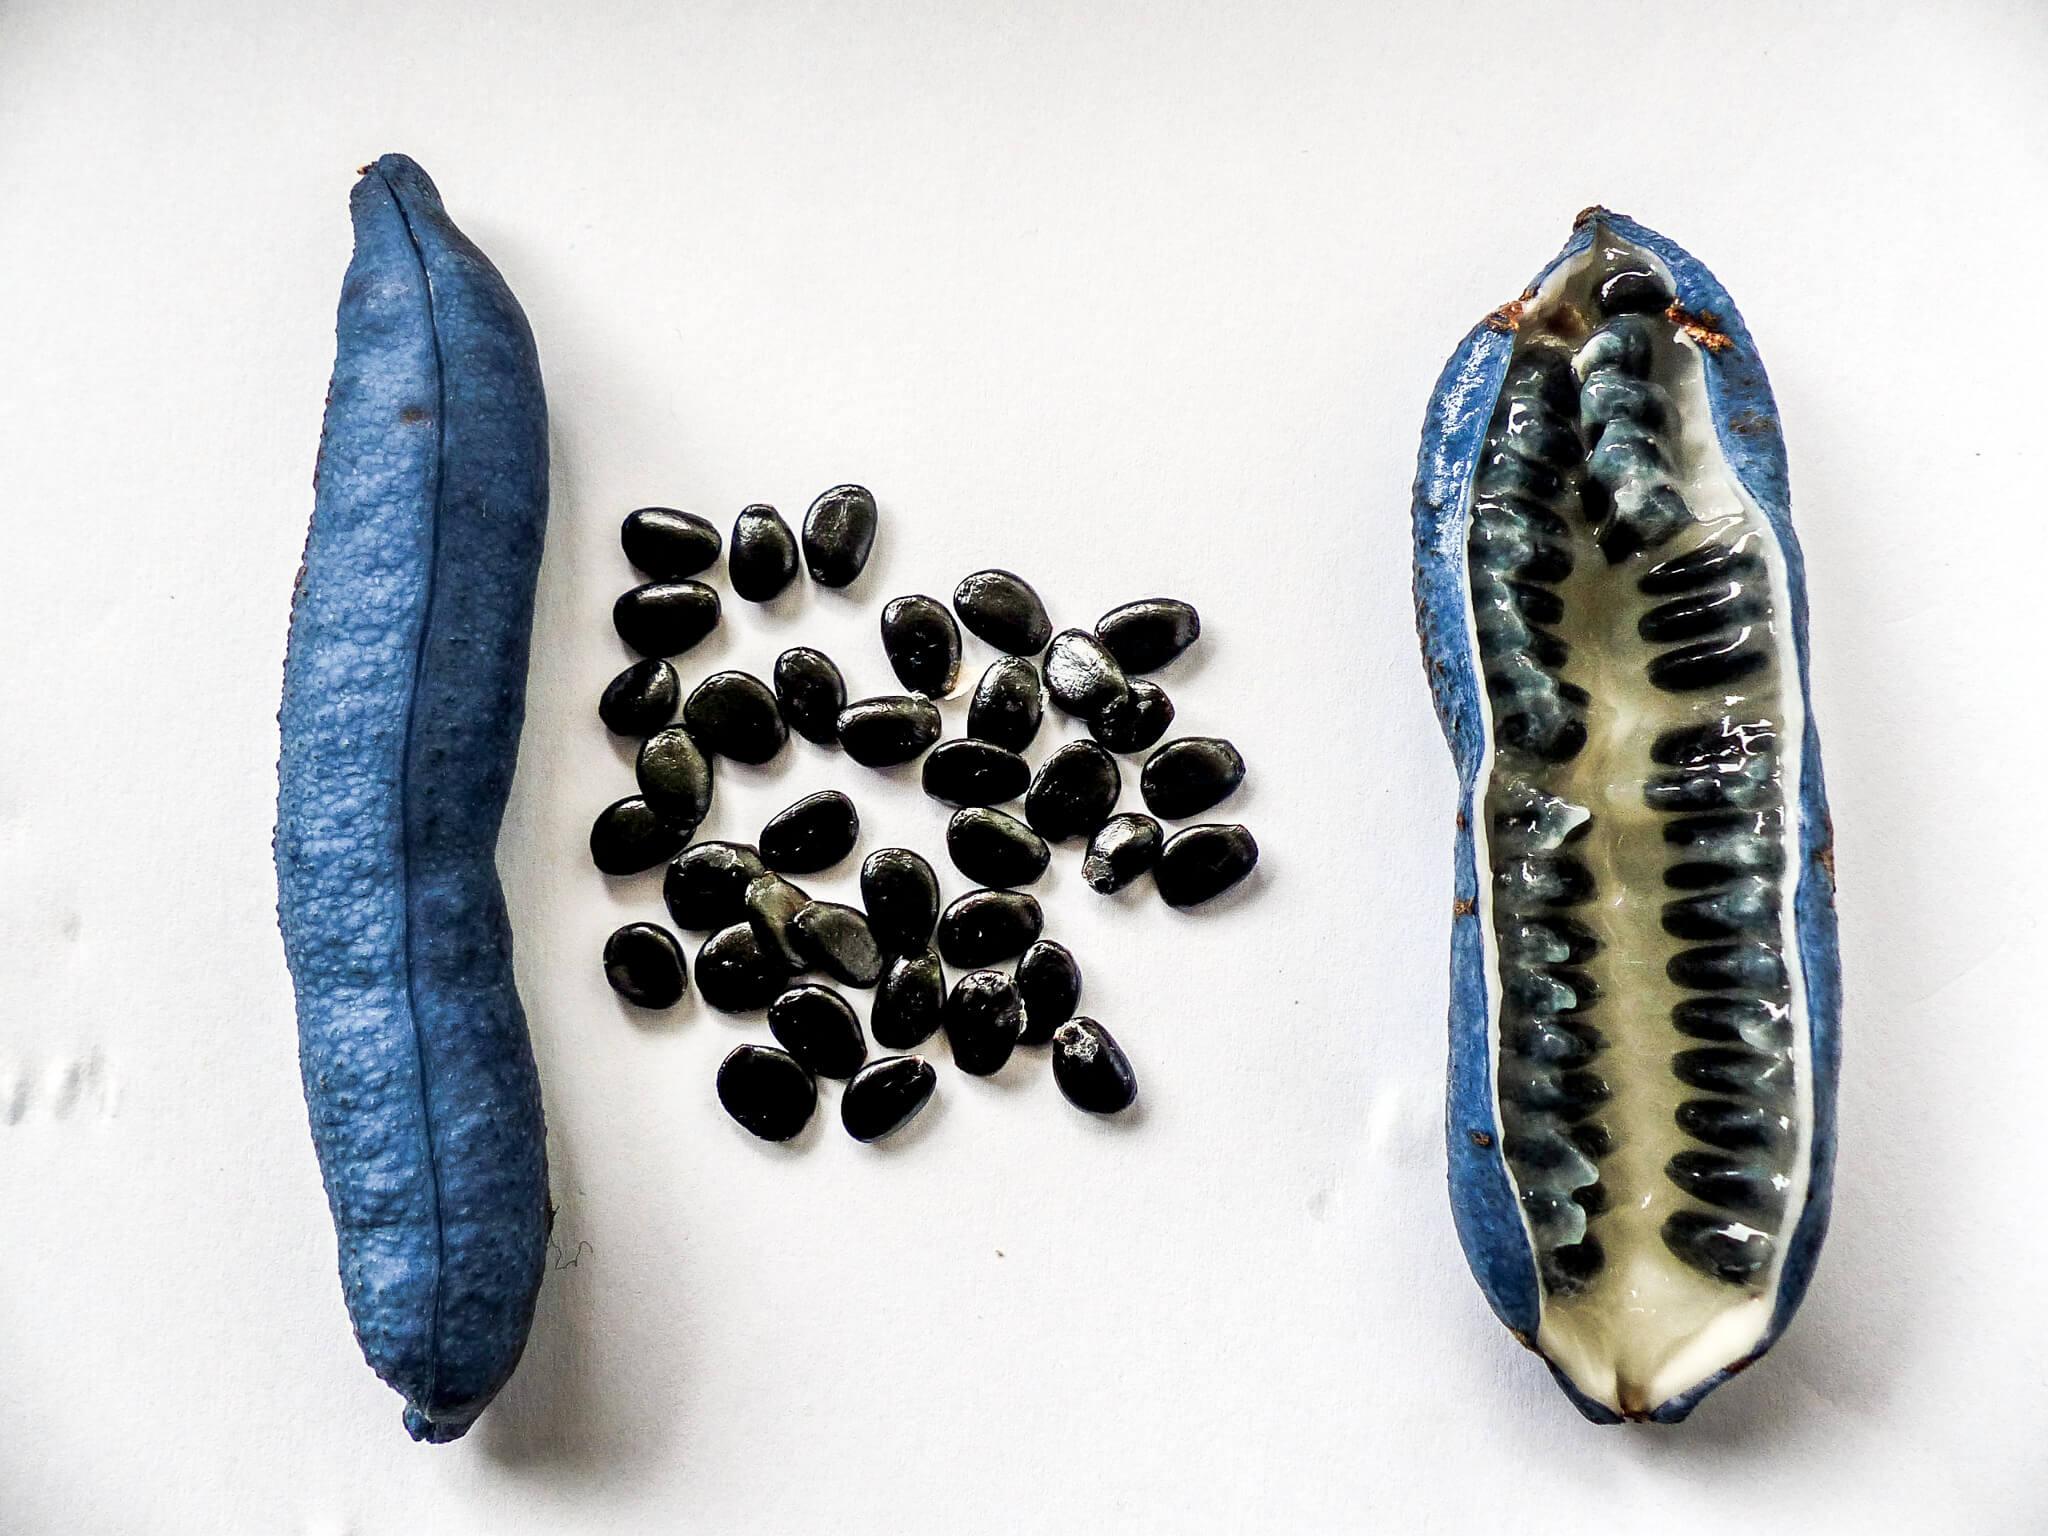 Blaugurke kochen Restaurant Gericht